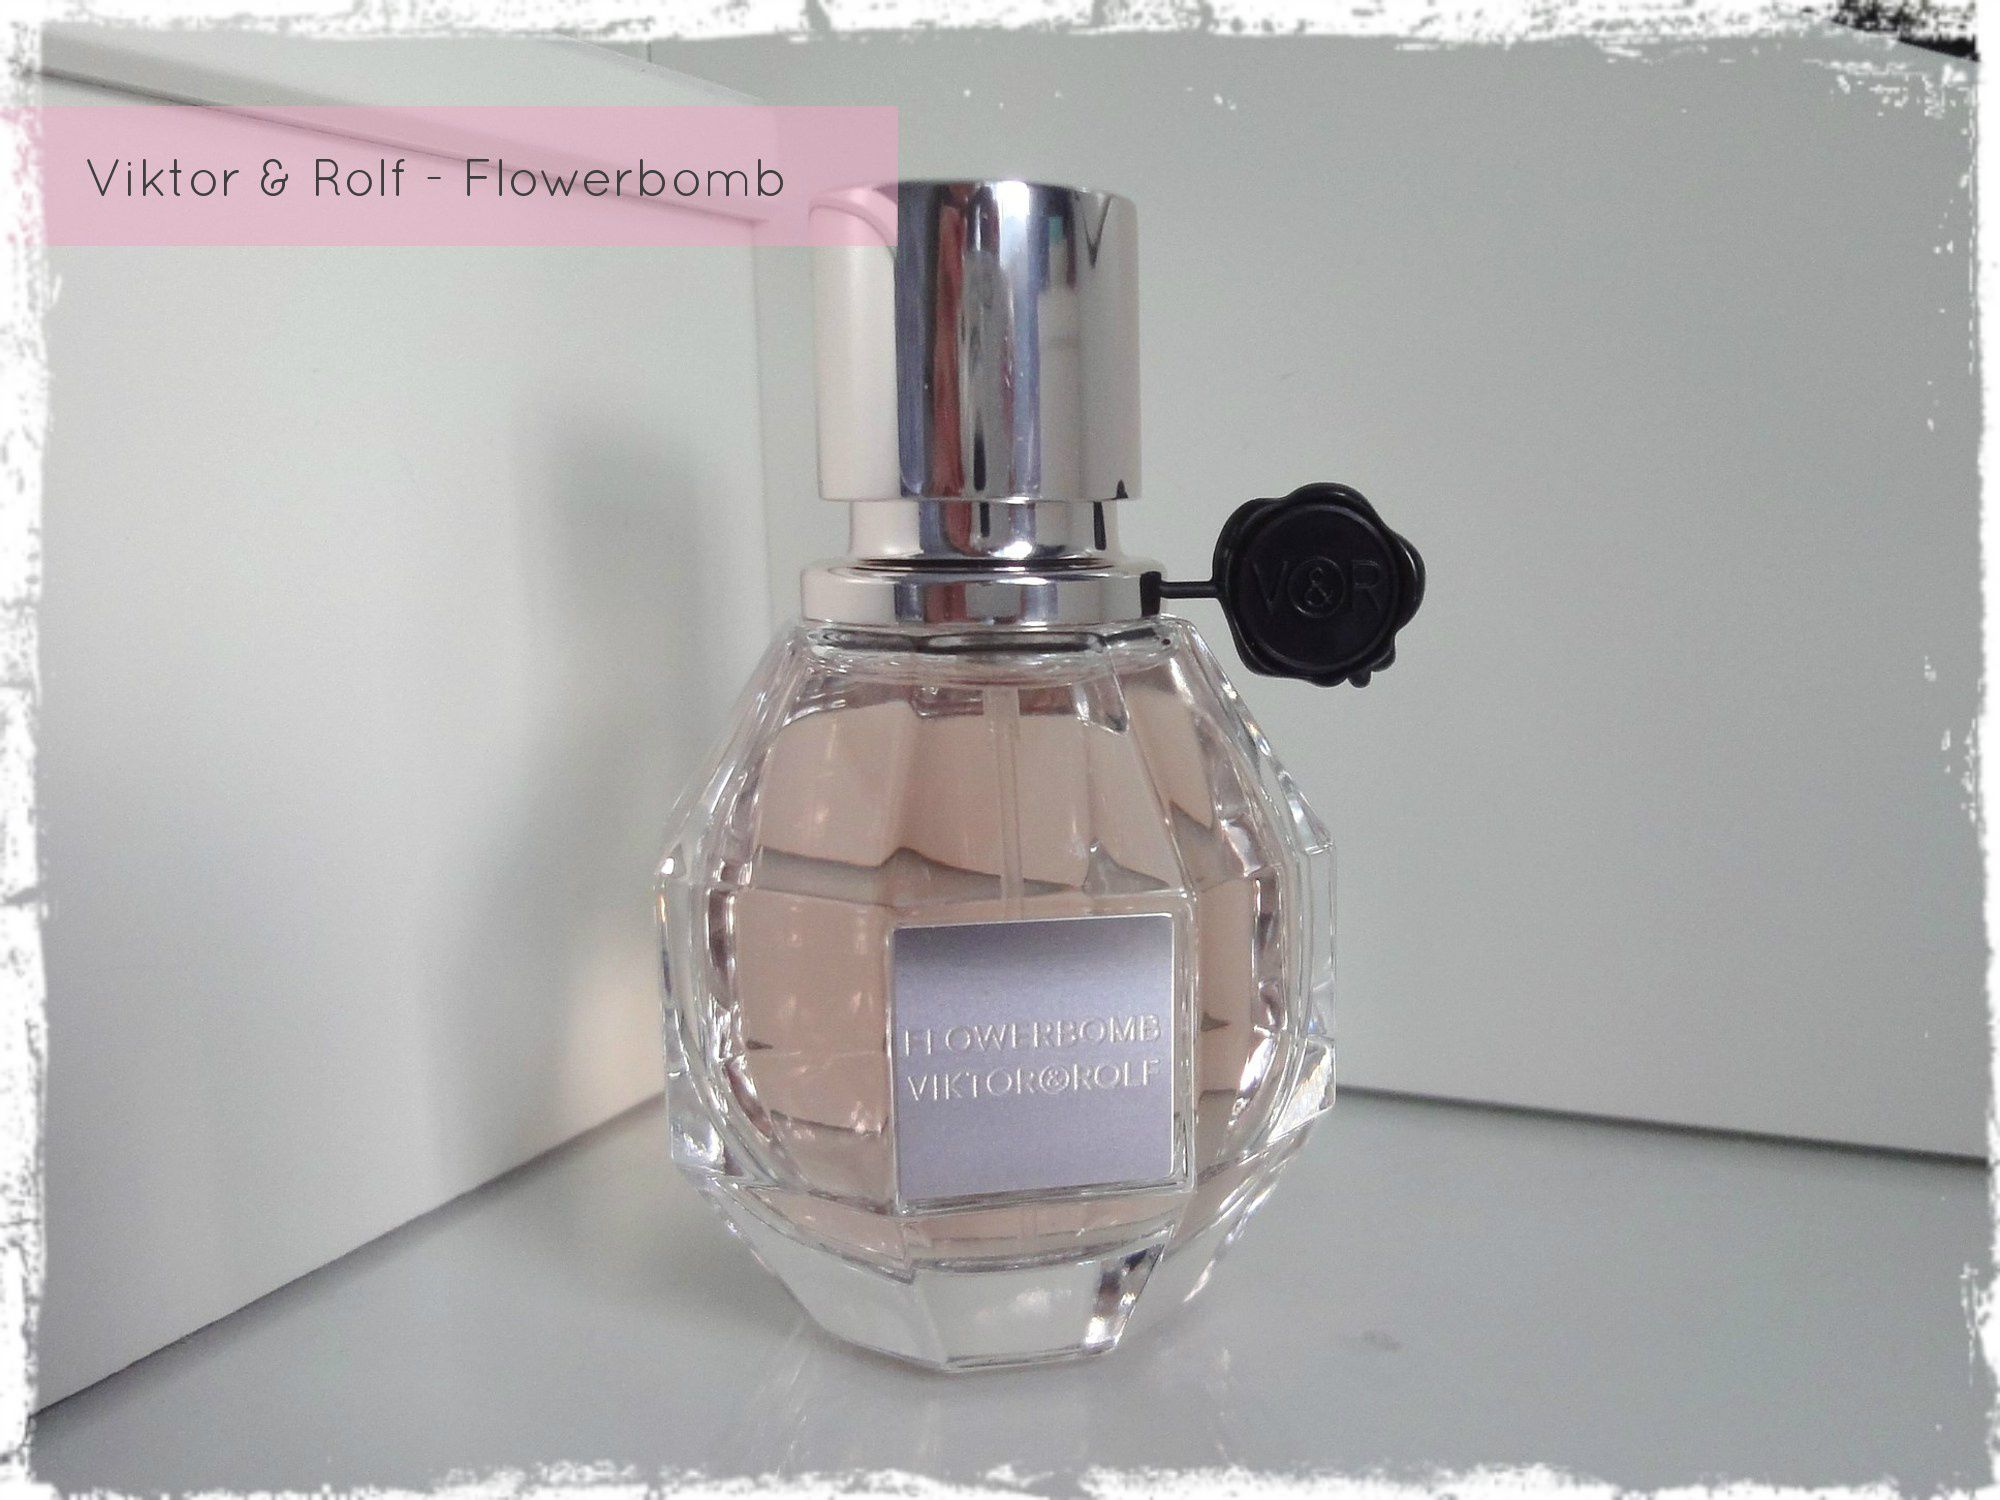 Viktor Rolf Flowerbomb Eau De Parfum Spray Beauty Makeup